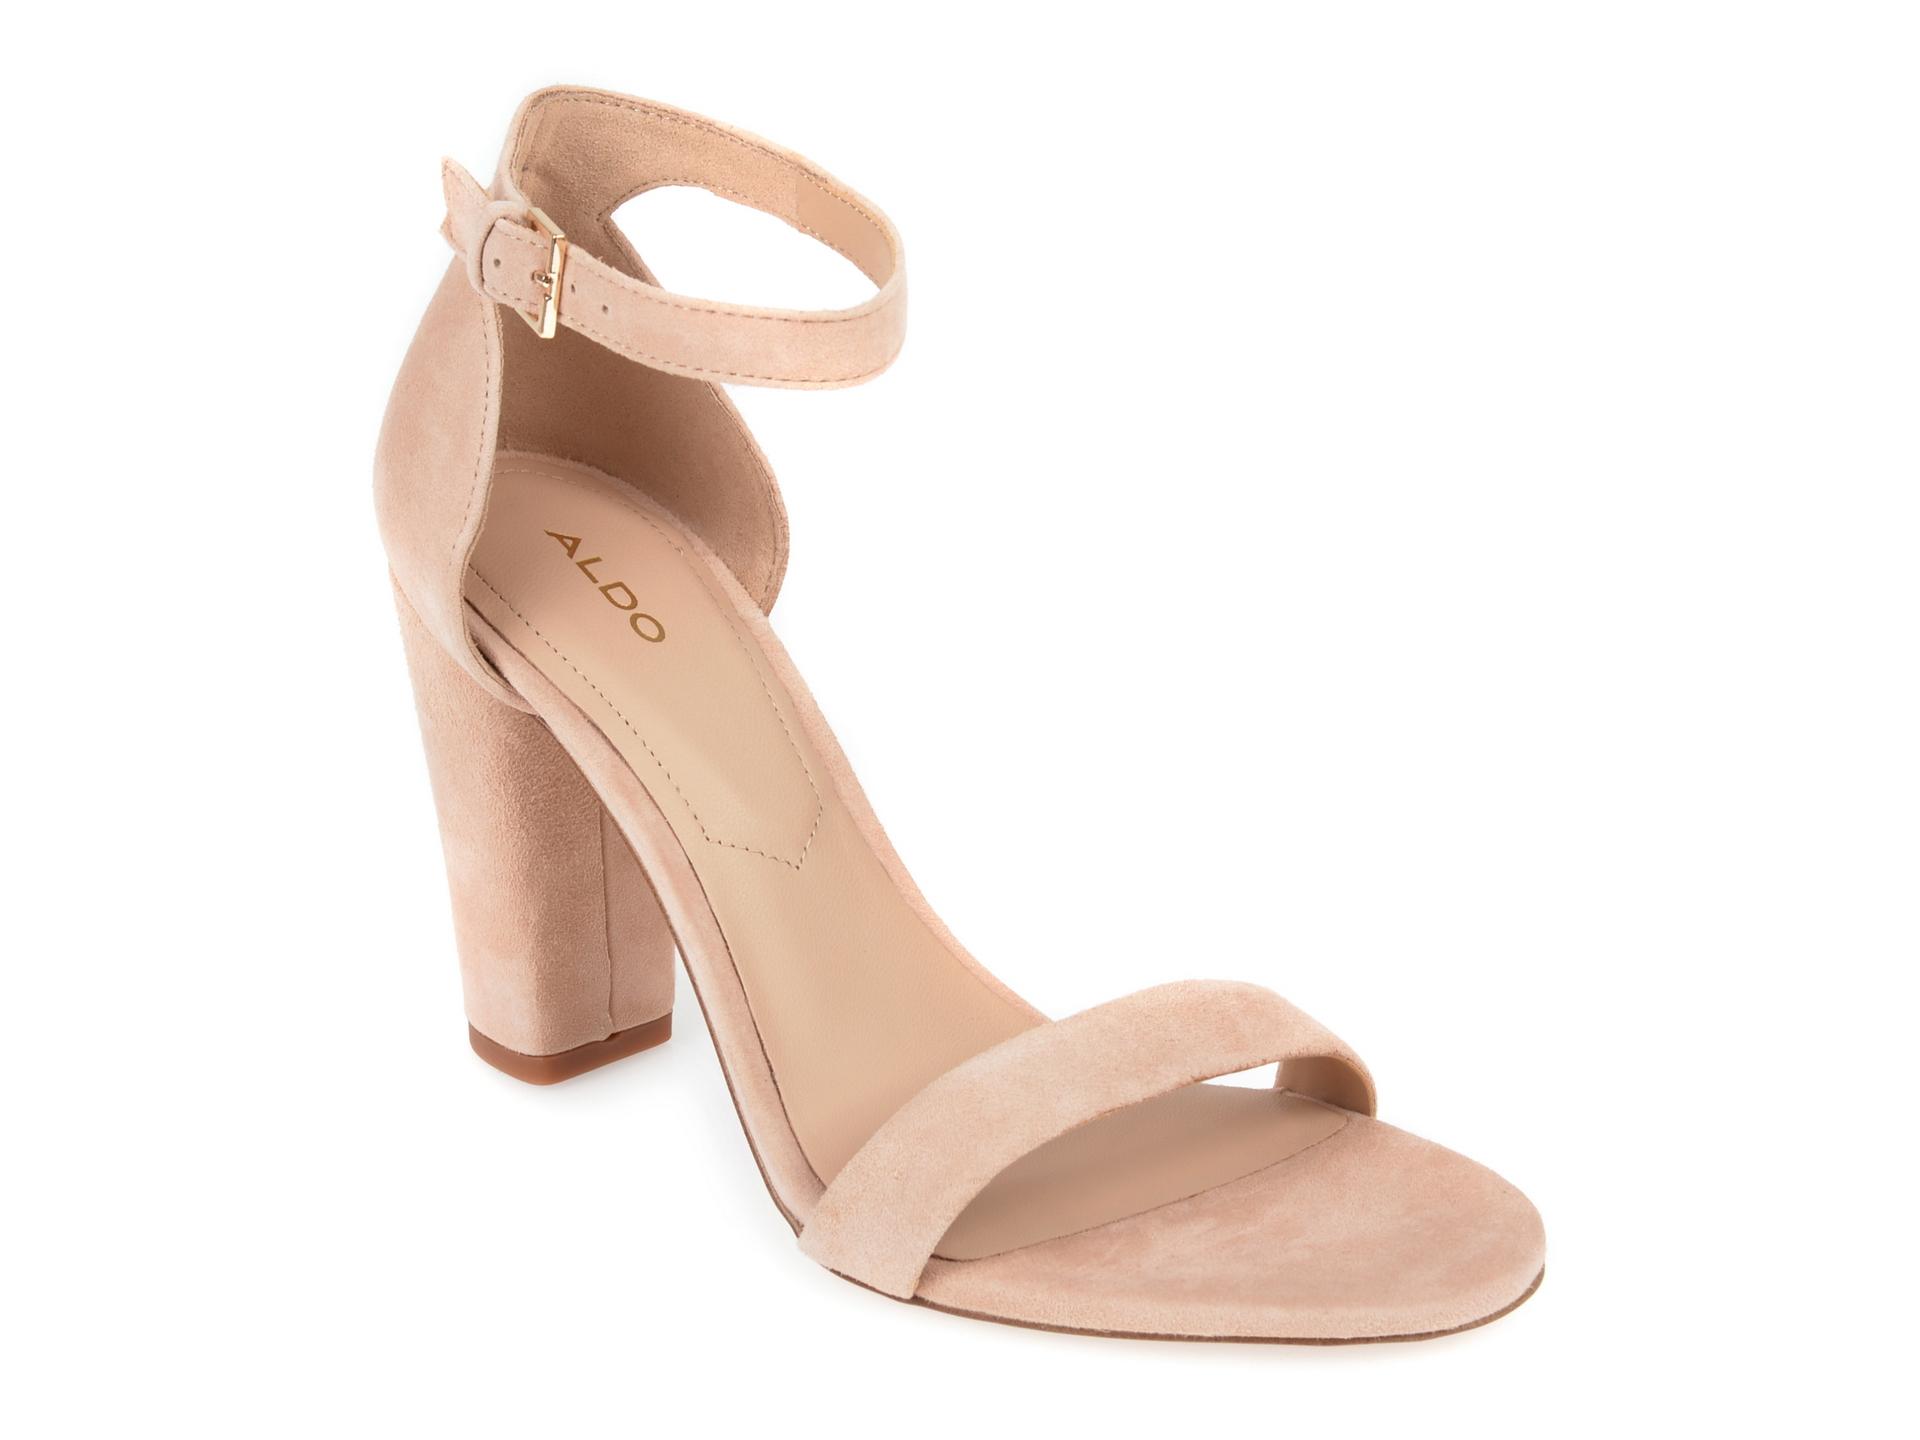 Sandale ALDO nude, Jerayclya270, din piele intoarsa New